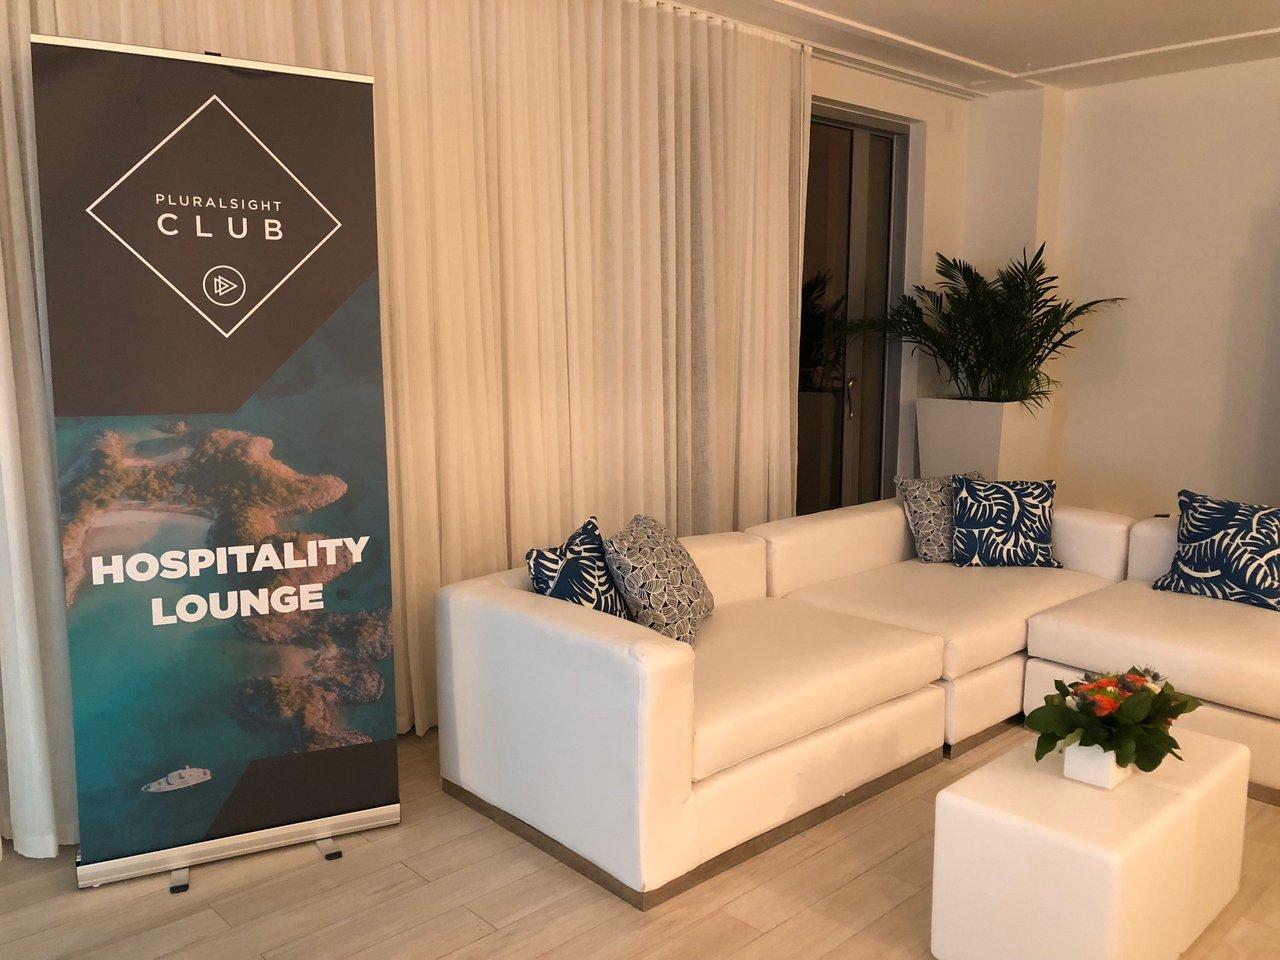 Club (Incentive Trip) photo IMG_9966.jpg